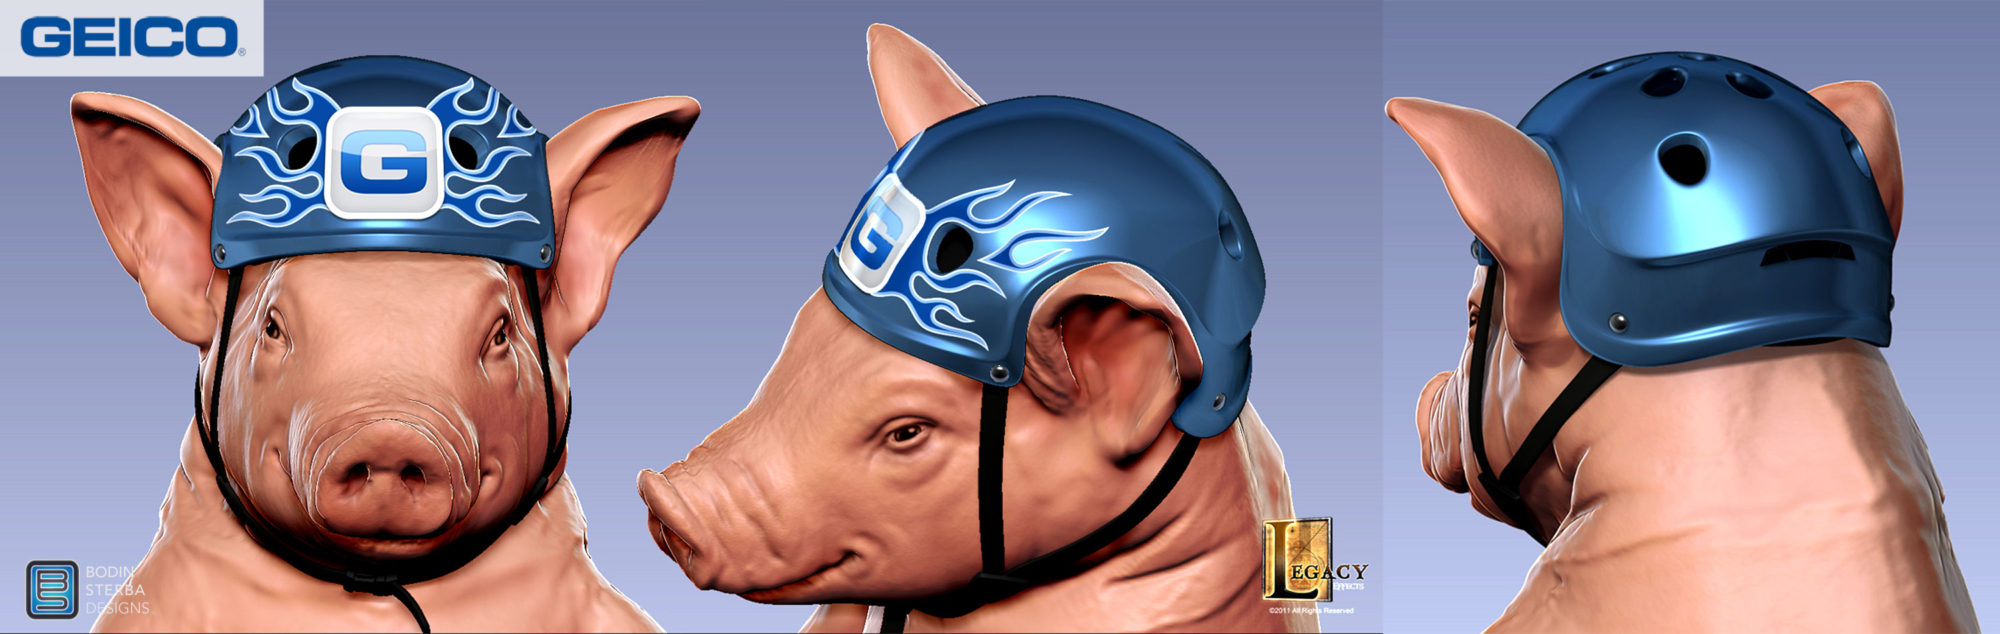 Geico Piggy Zip Line Commercial | BODIN STERBA DESIGN